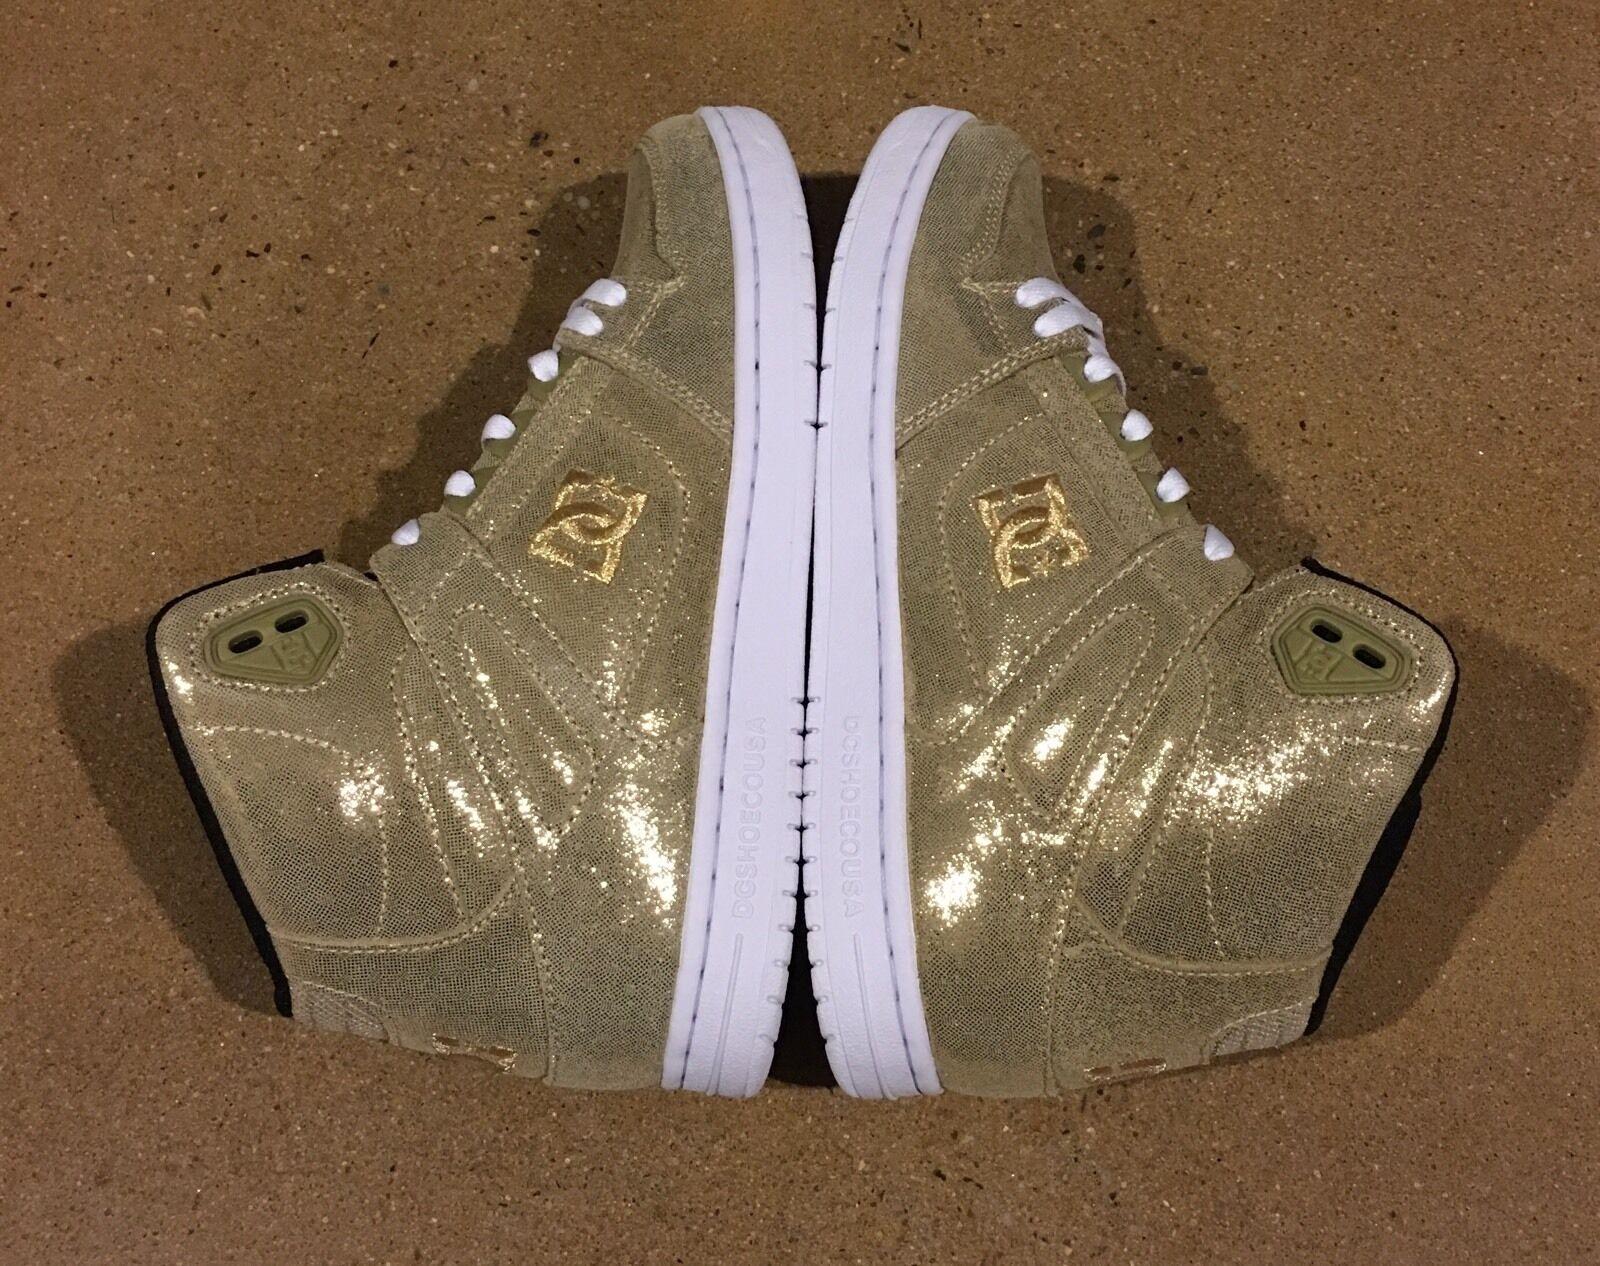 DC Rebound High SE Women's Size 7 US Gold BMX Skate Shoes Sneakers